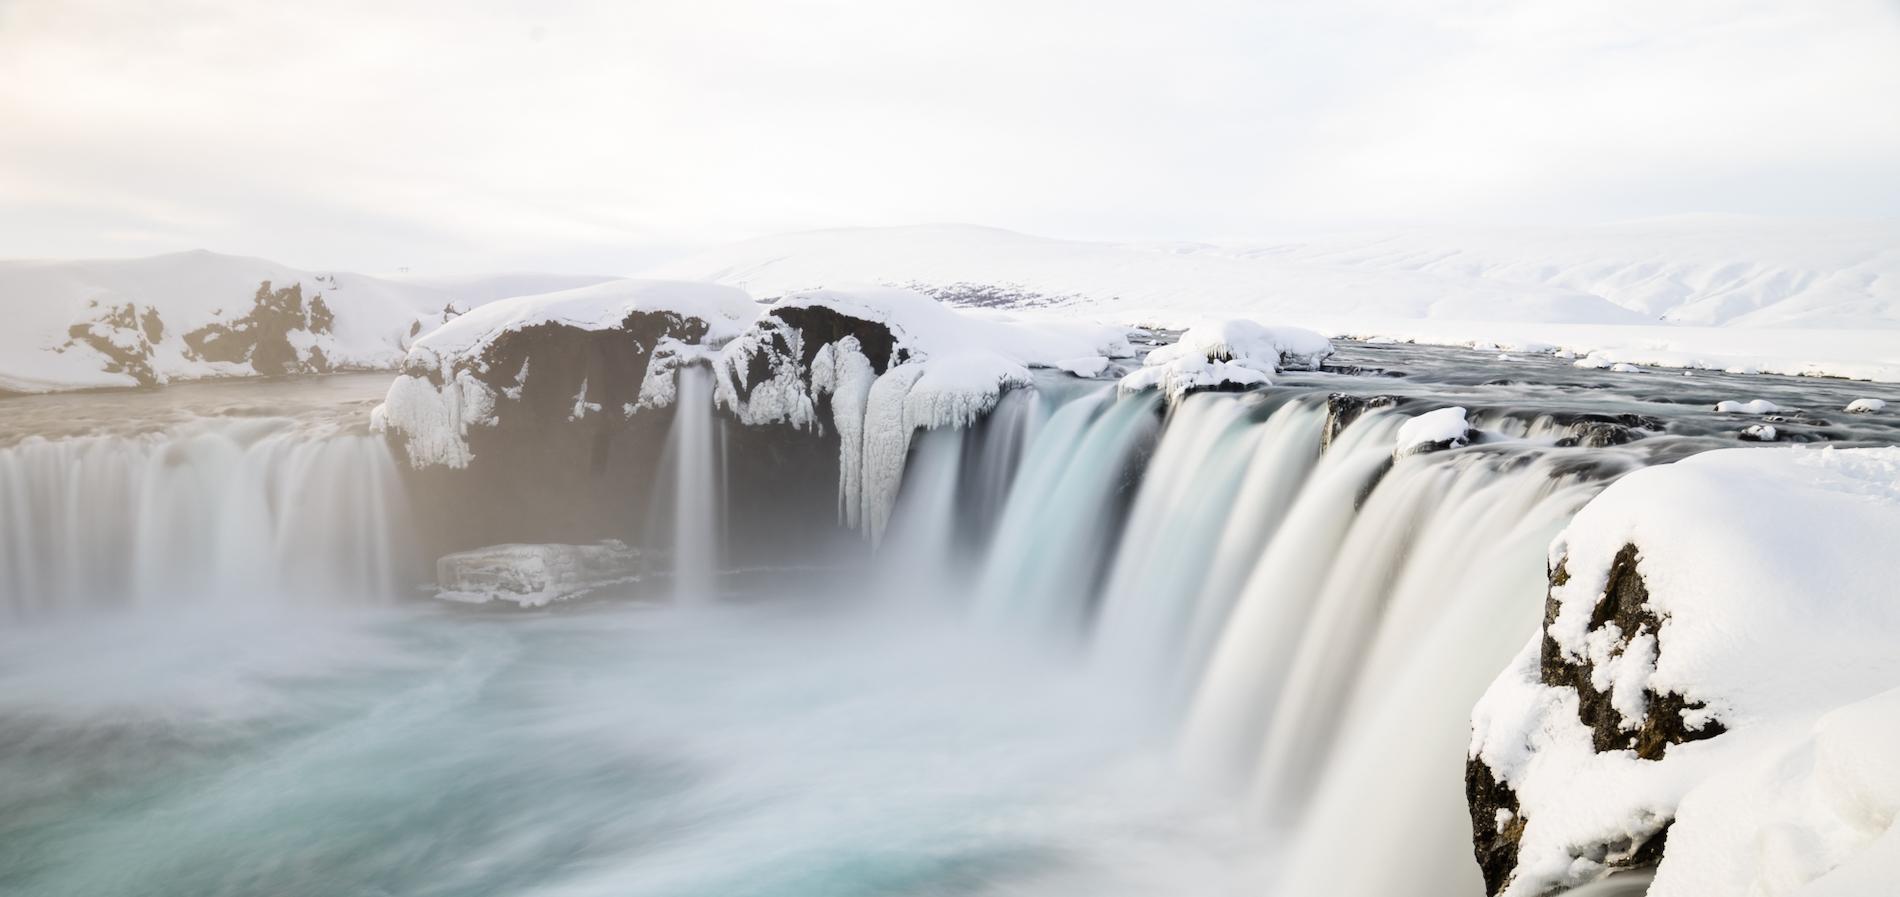 Chris Burkard photo of Arctic waterfall